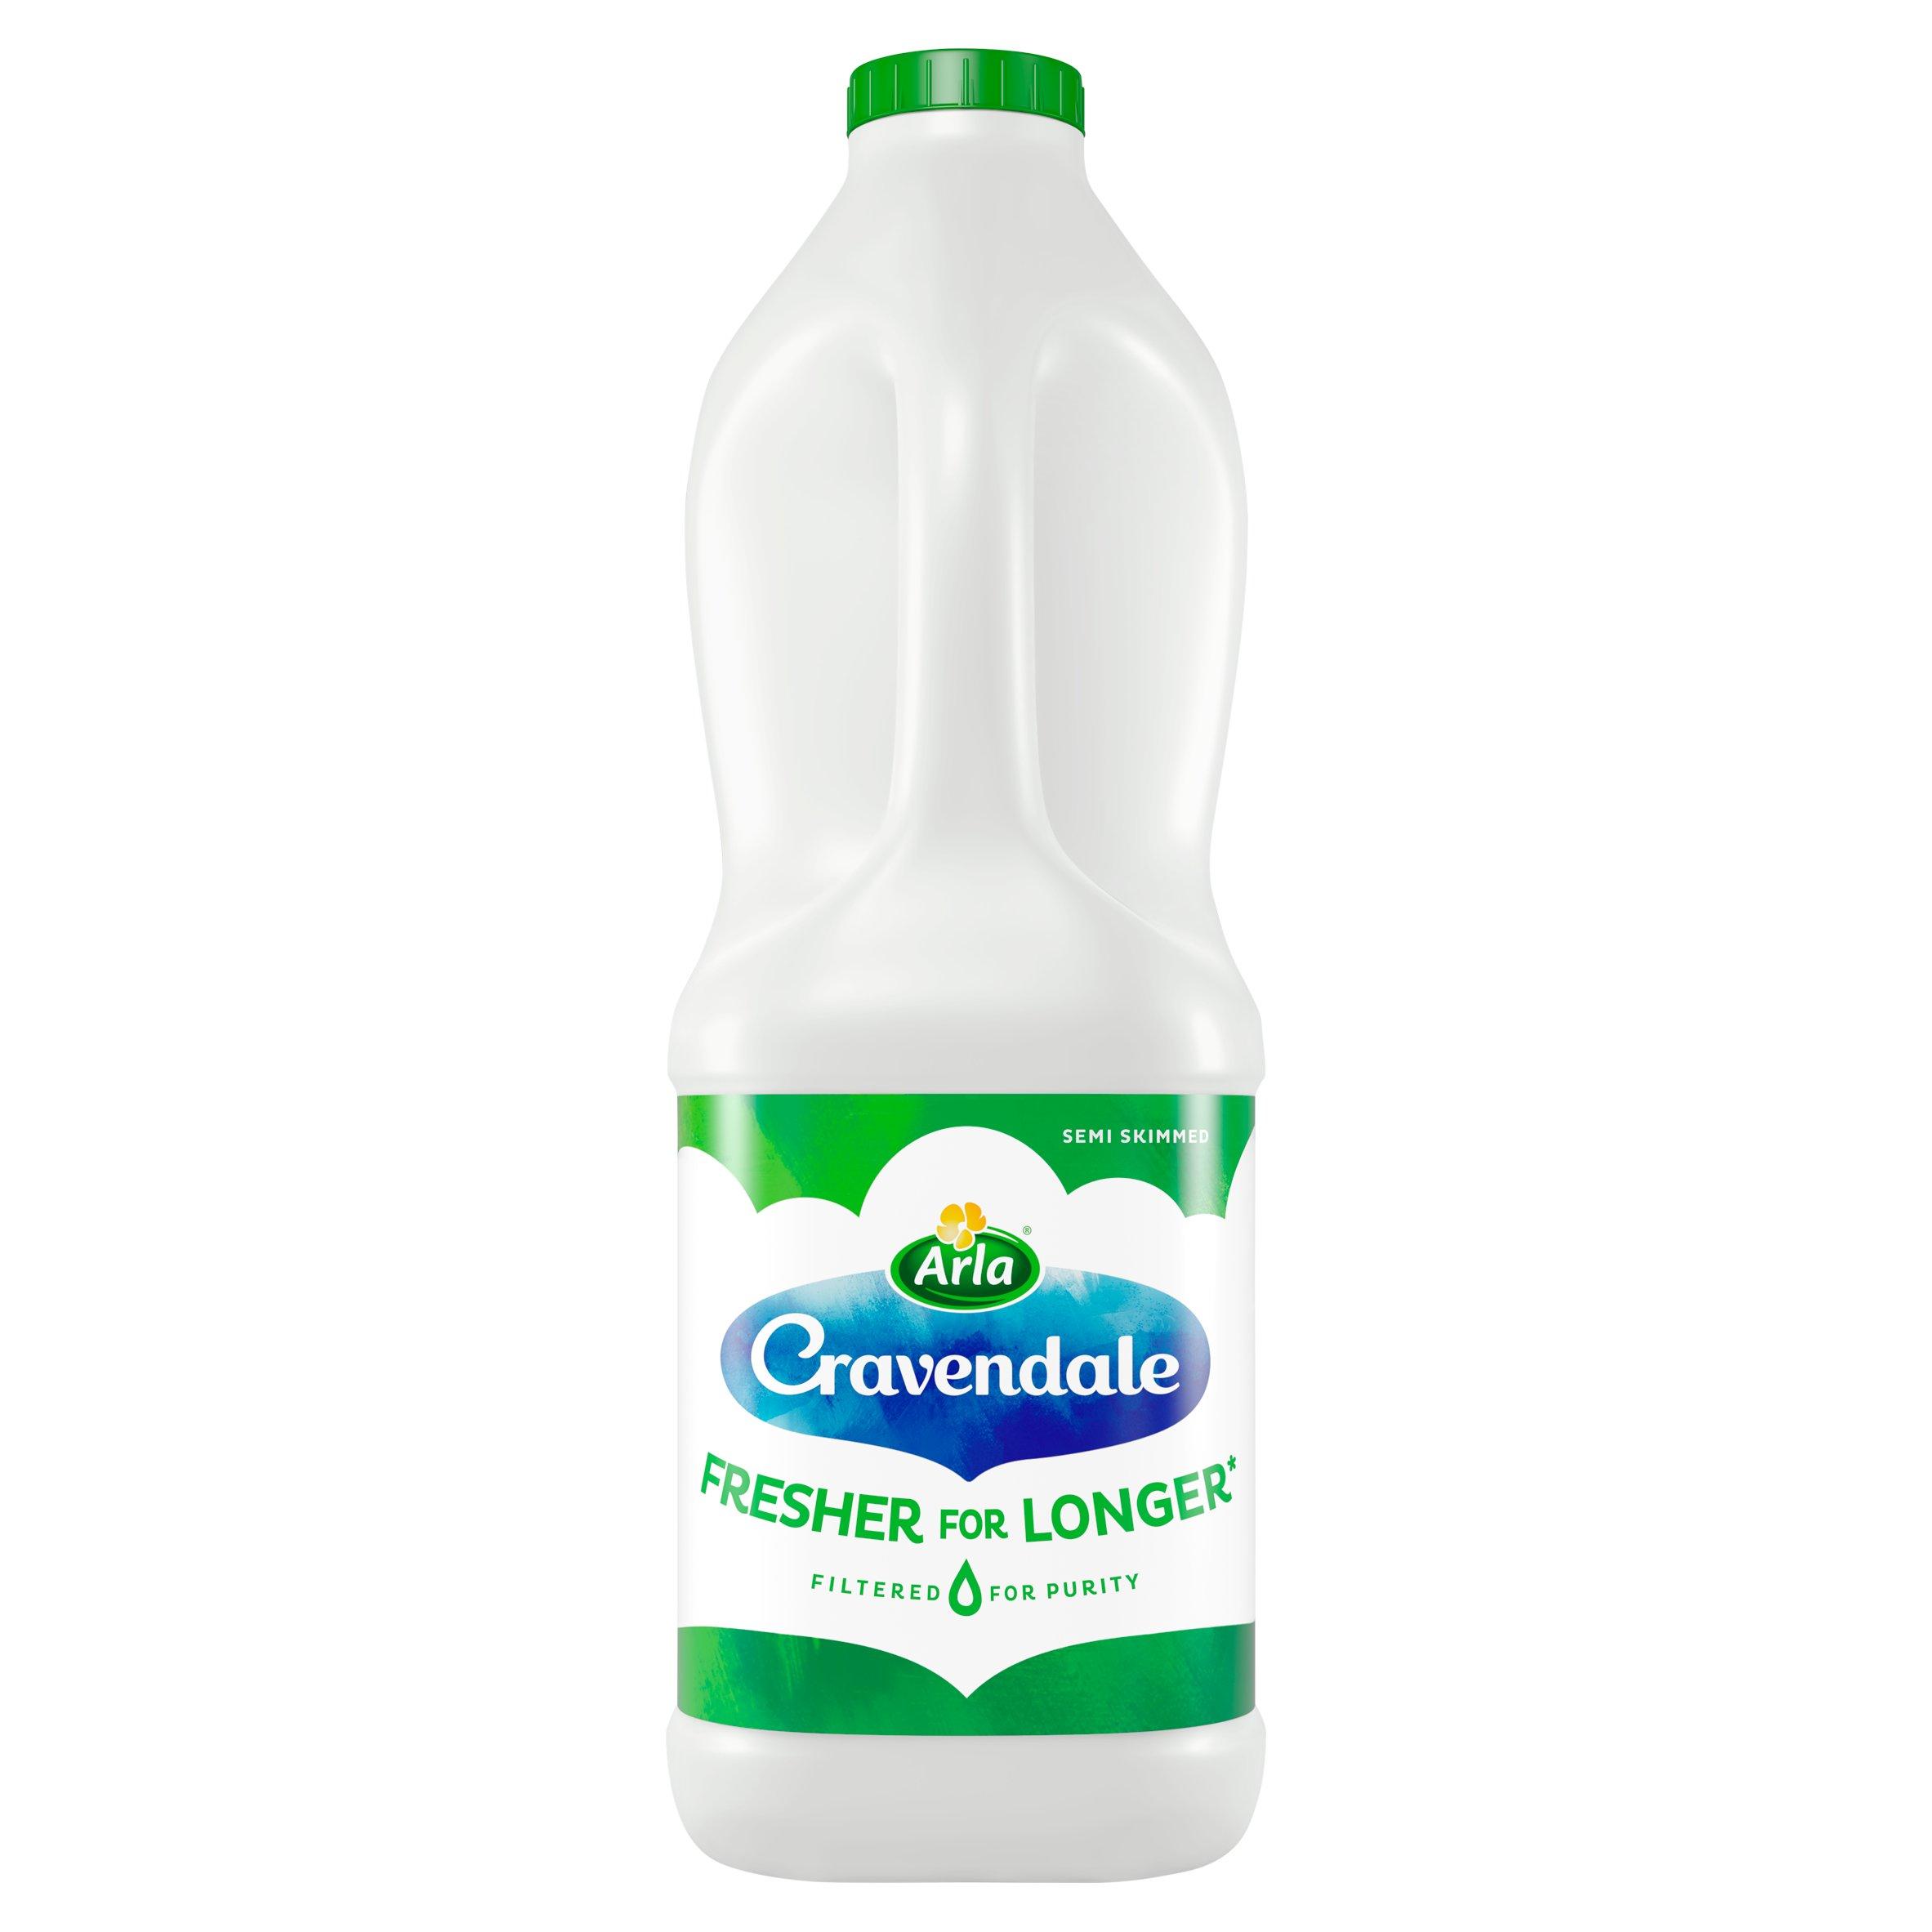 Cravendale Semi Skimmed Milk 2 Litre